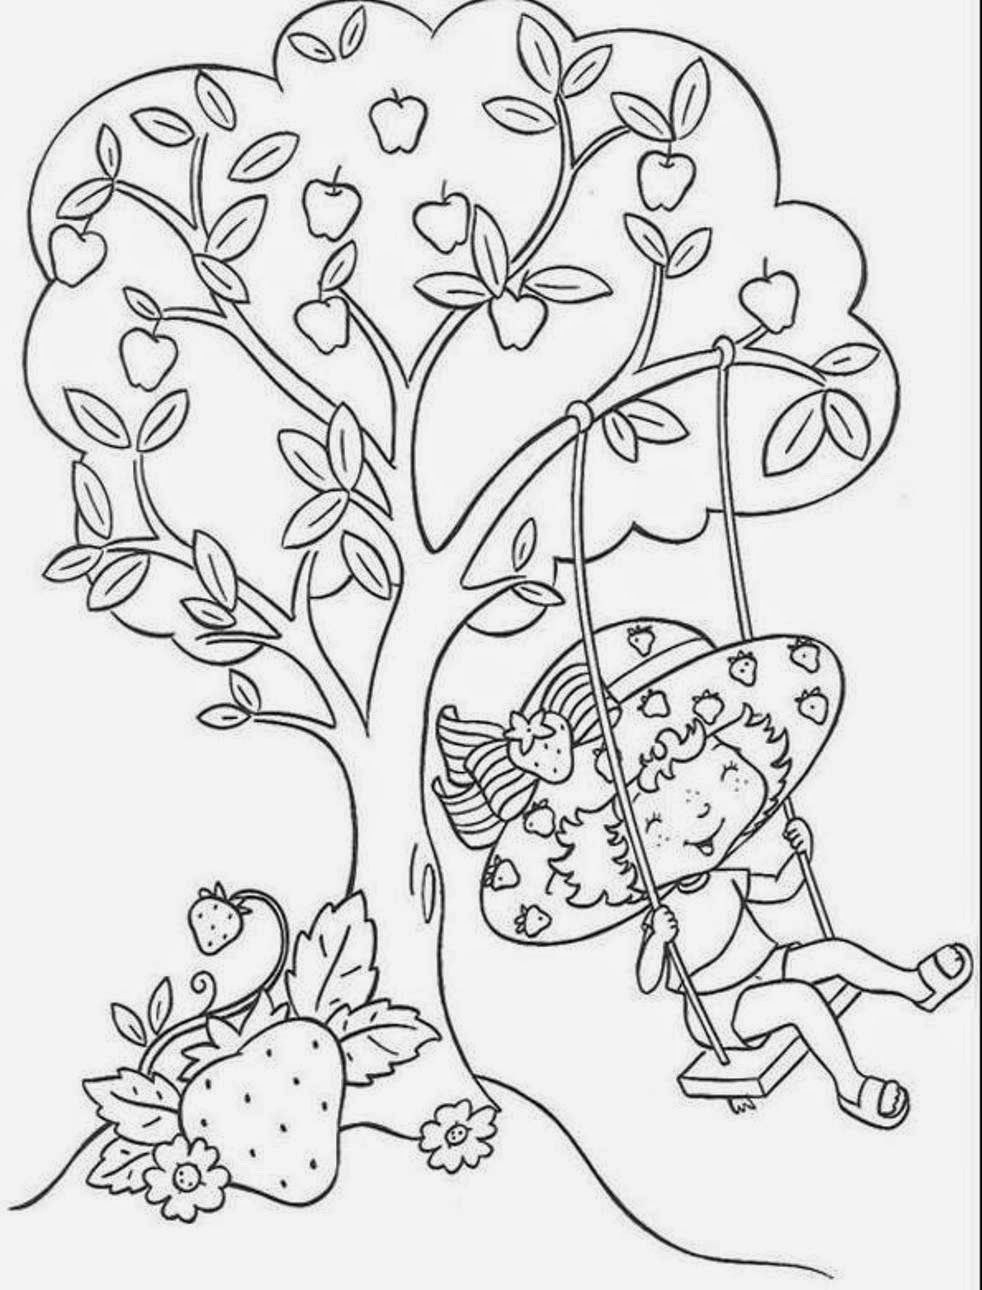 Desenhos De Moranguinho E Sua Turma Para Colorir, Pintar tout Coloriage Charlotte Aux Fraises Et Ses Amies